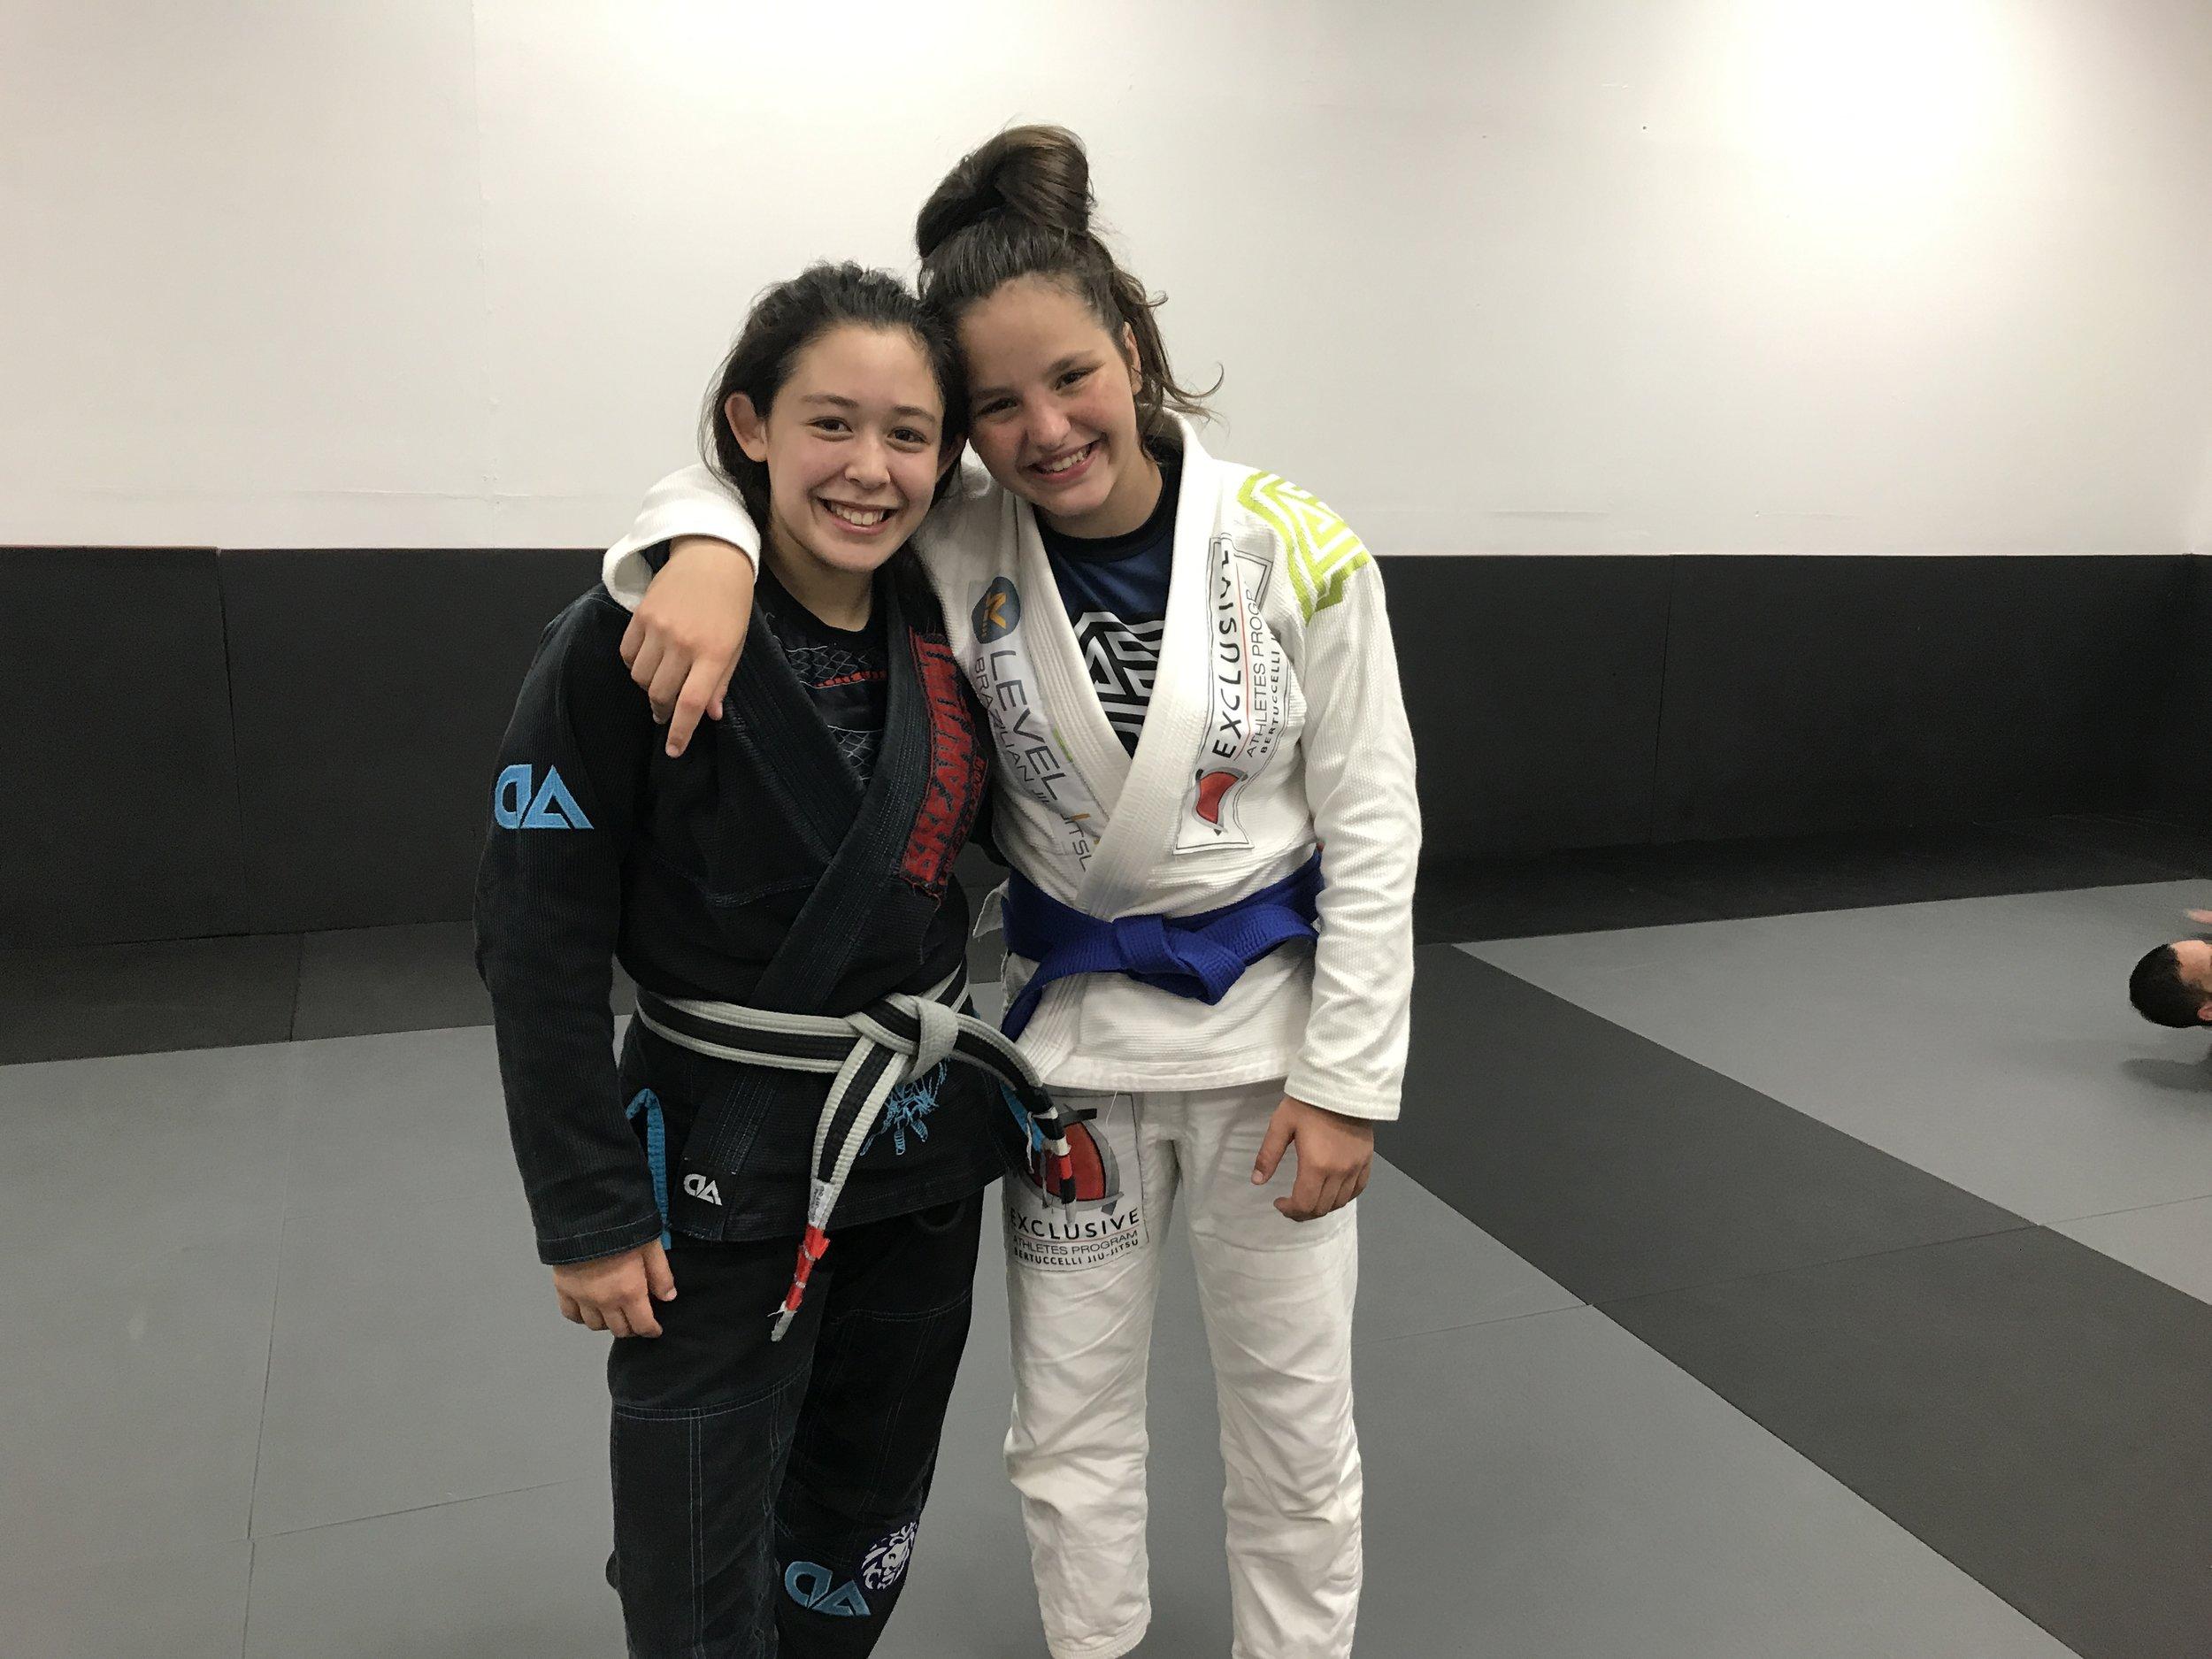 jiu jitsu Champions